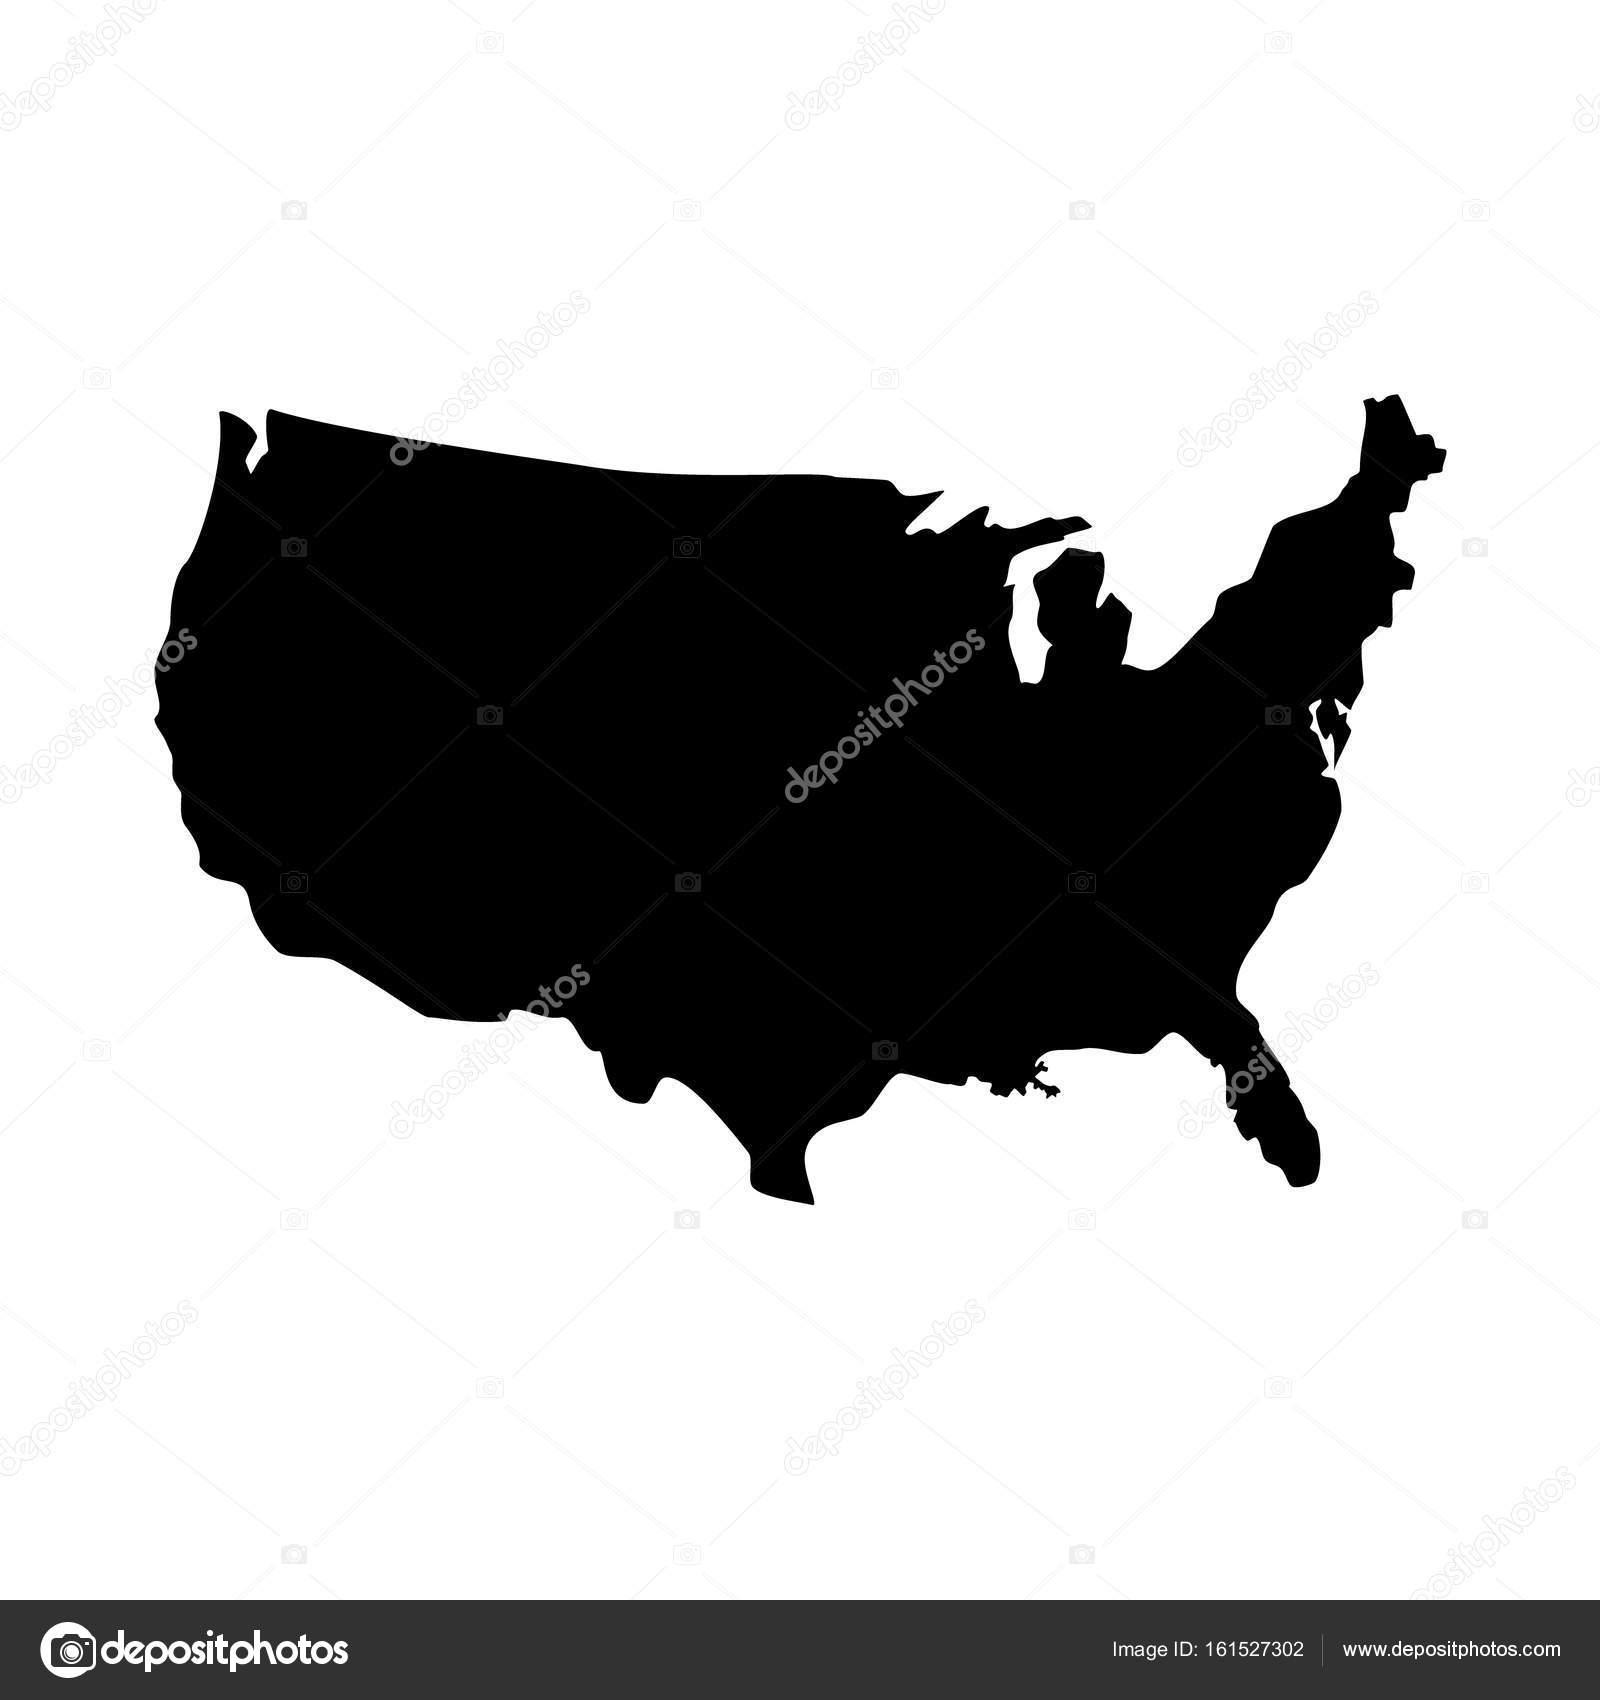 USA map icon — Stock Photo © viktorijareut #161527302